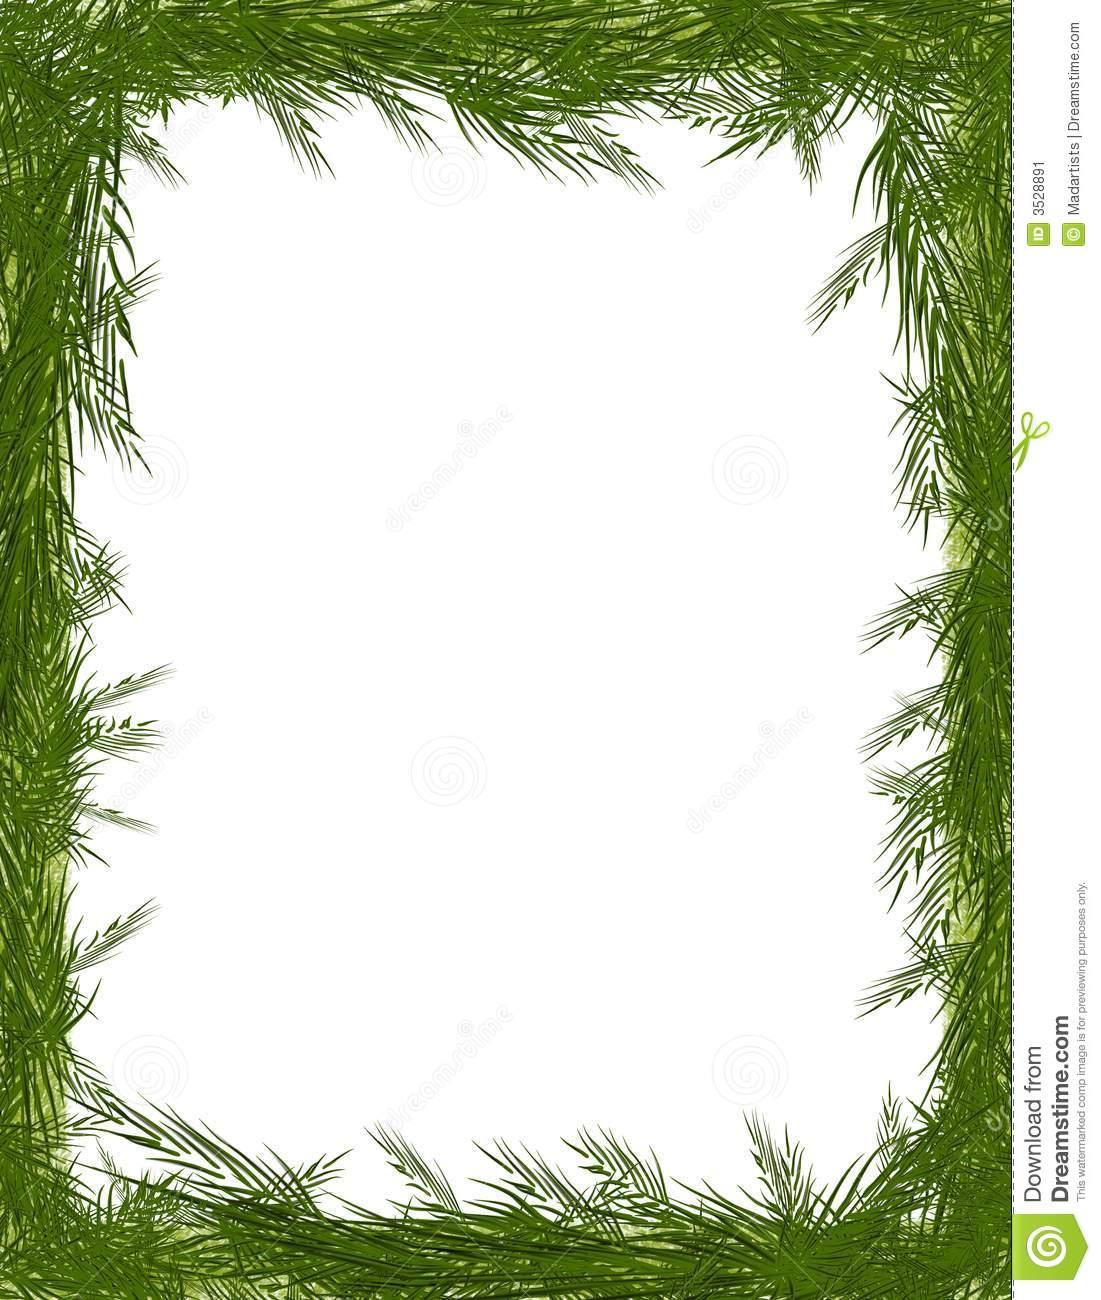 Pine Needle Tree Branch Frame Stock Image.